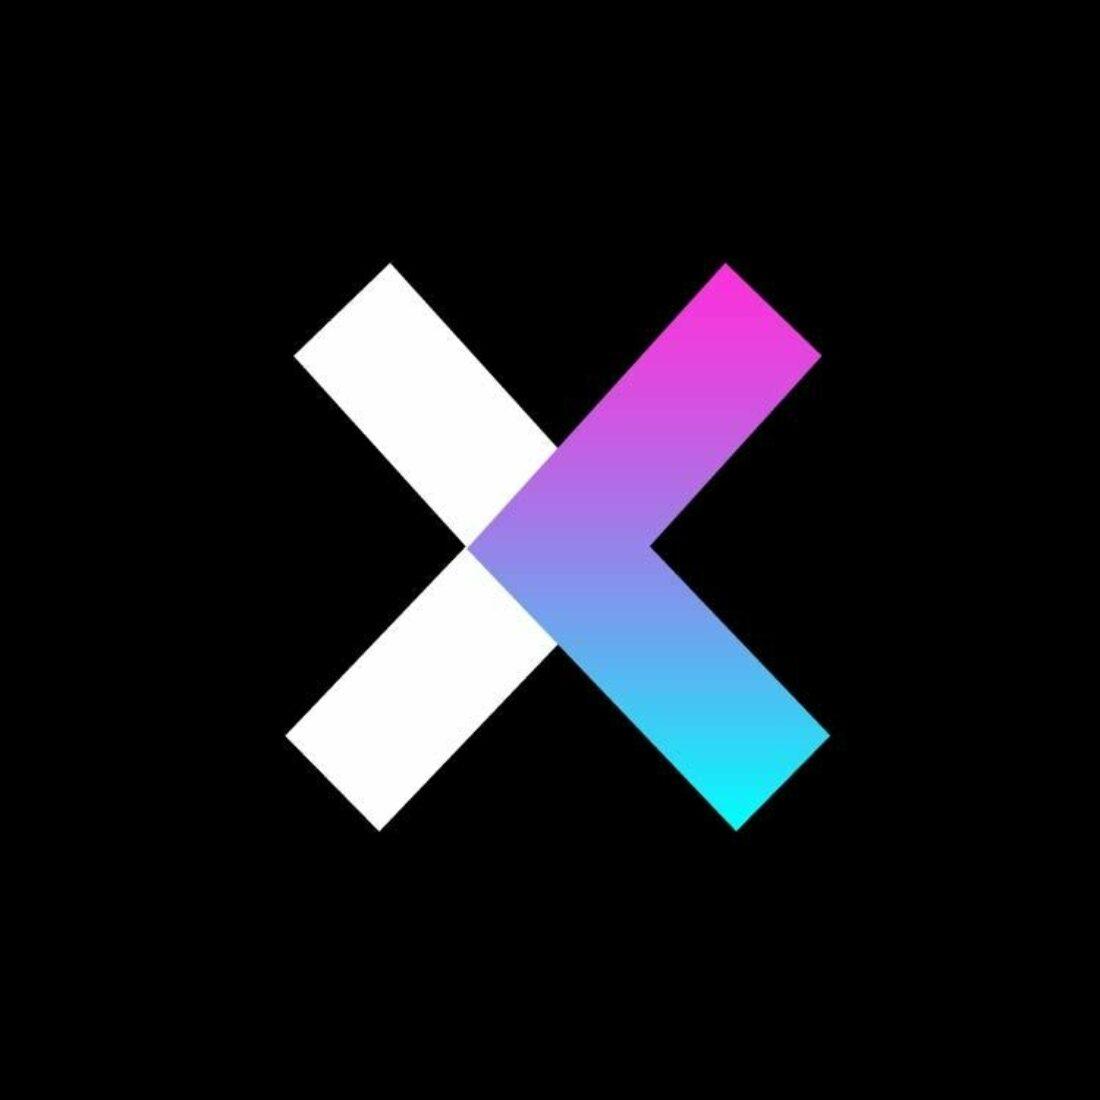 Festival X 2020